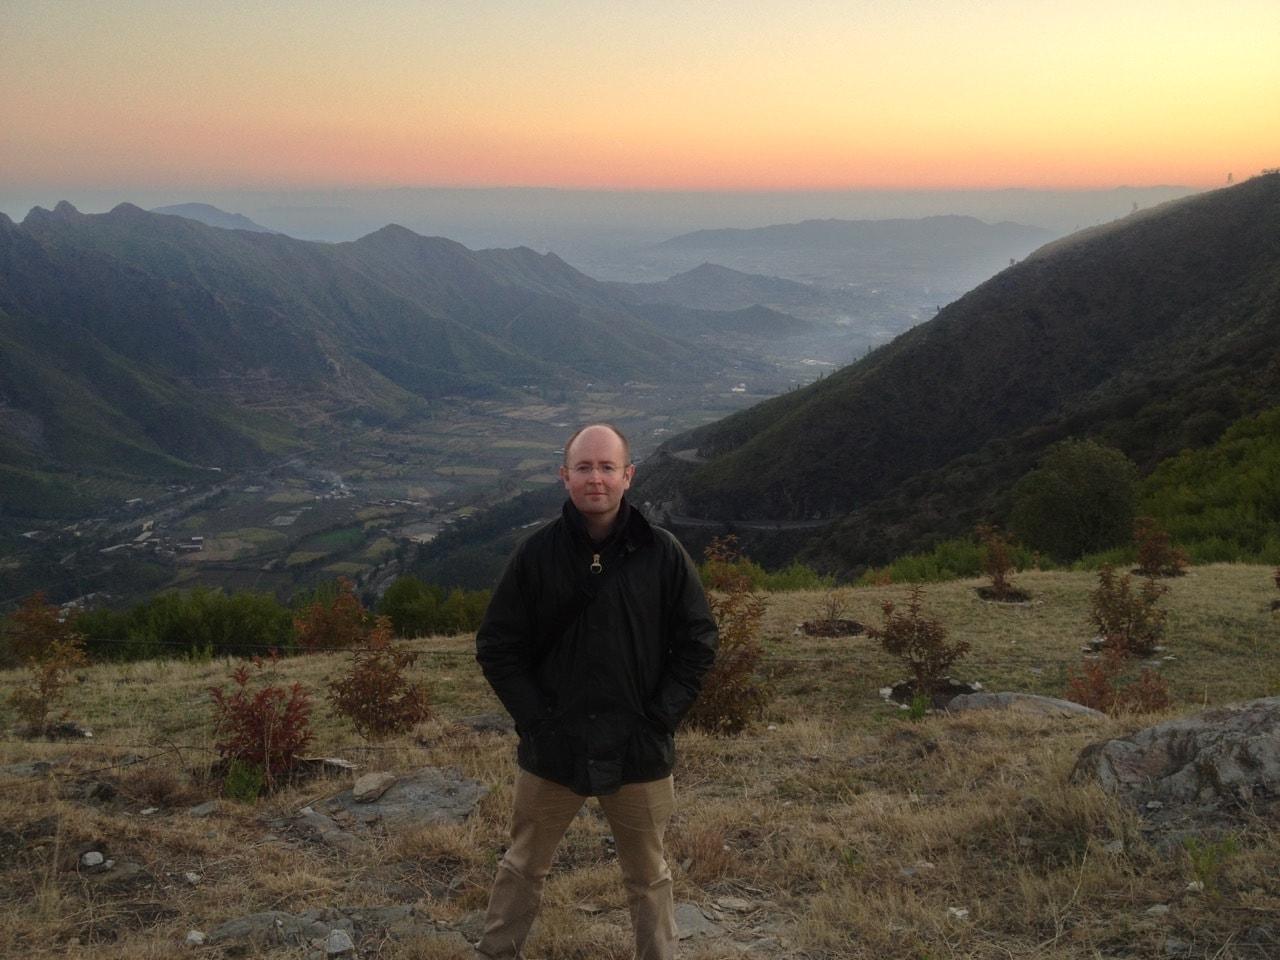 Dr John Horgan on his visit to Swat Valley.